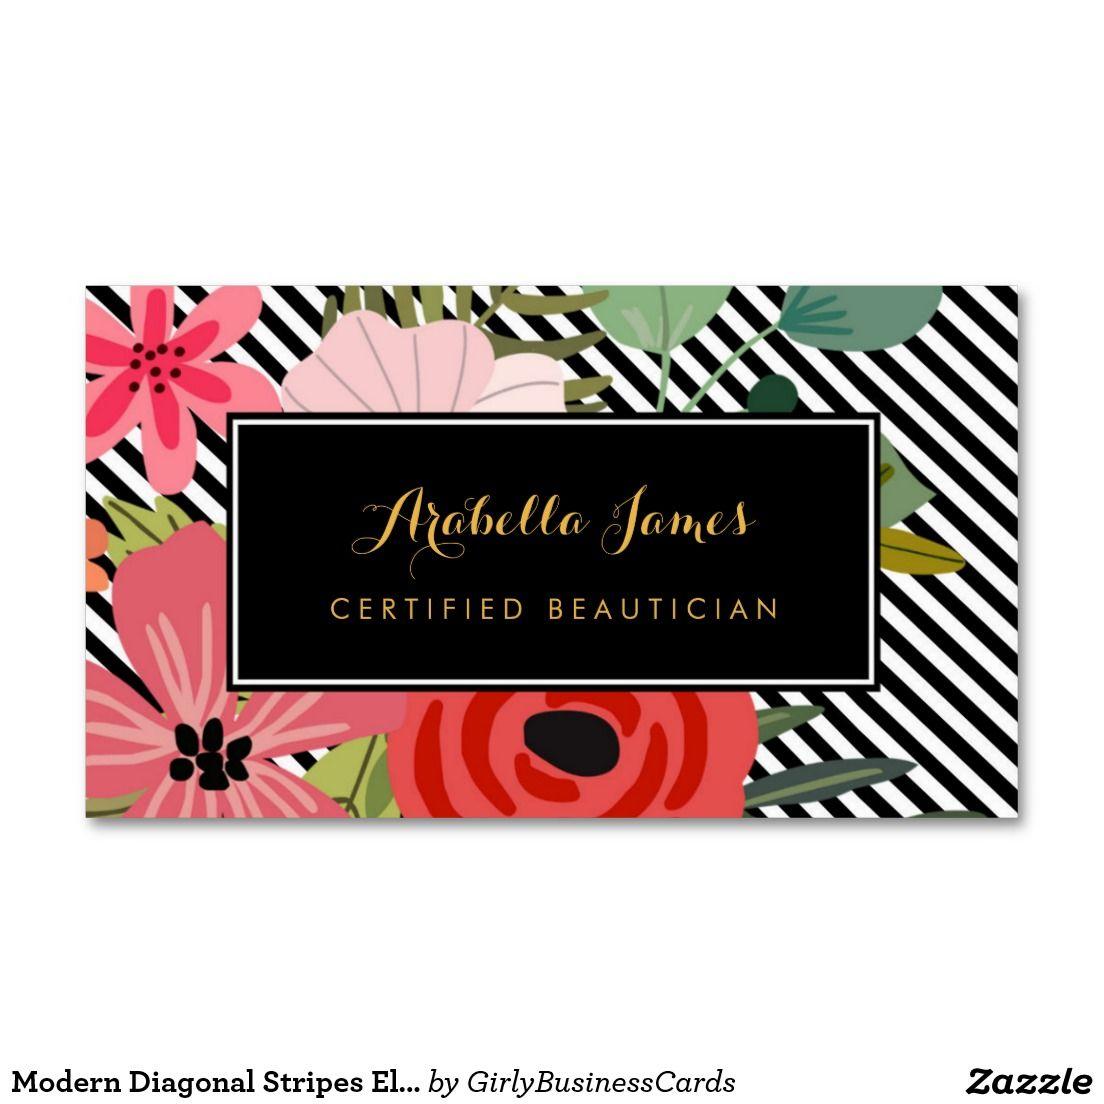 Modern Diagonal Stripes Elegant Floral Beautician Business Card